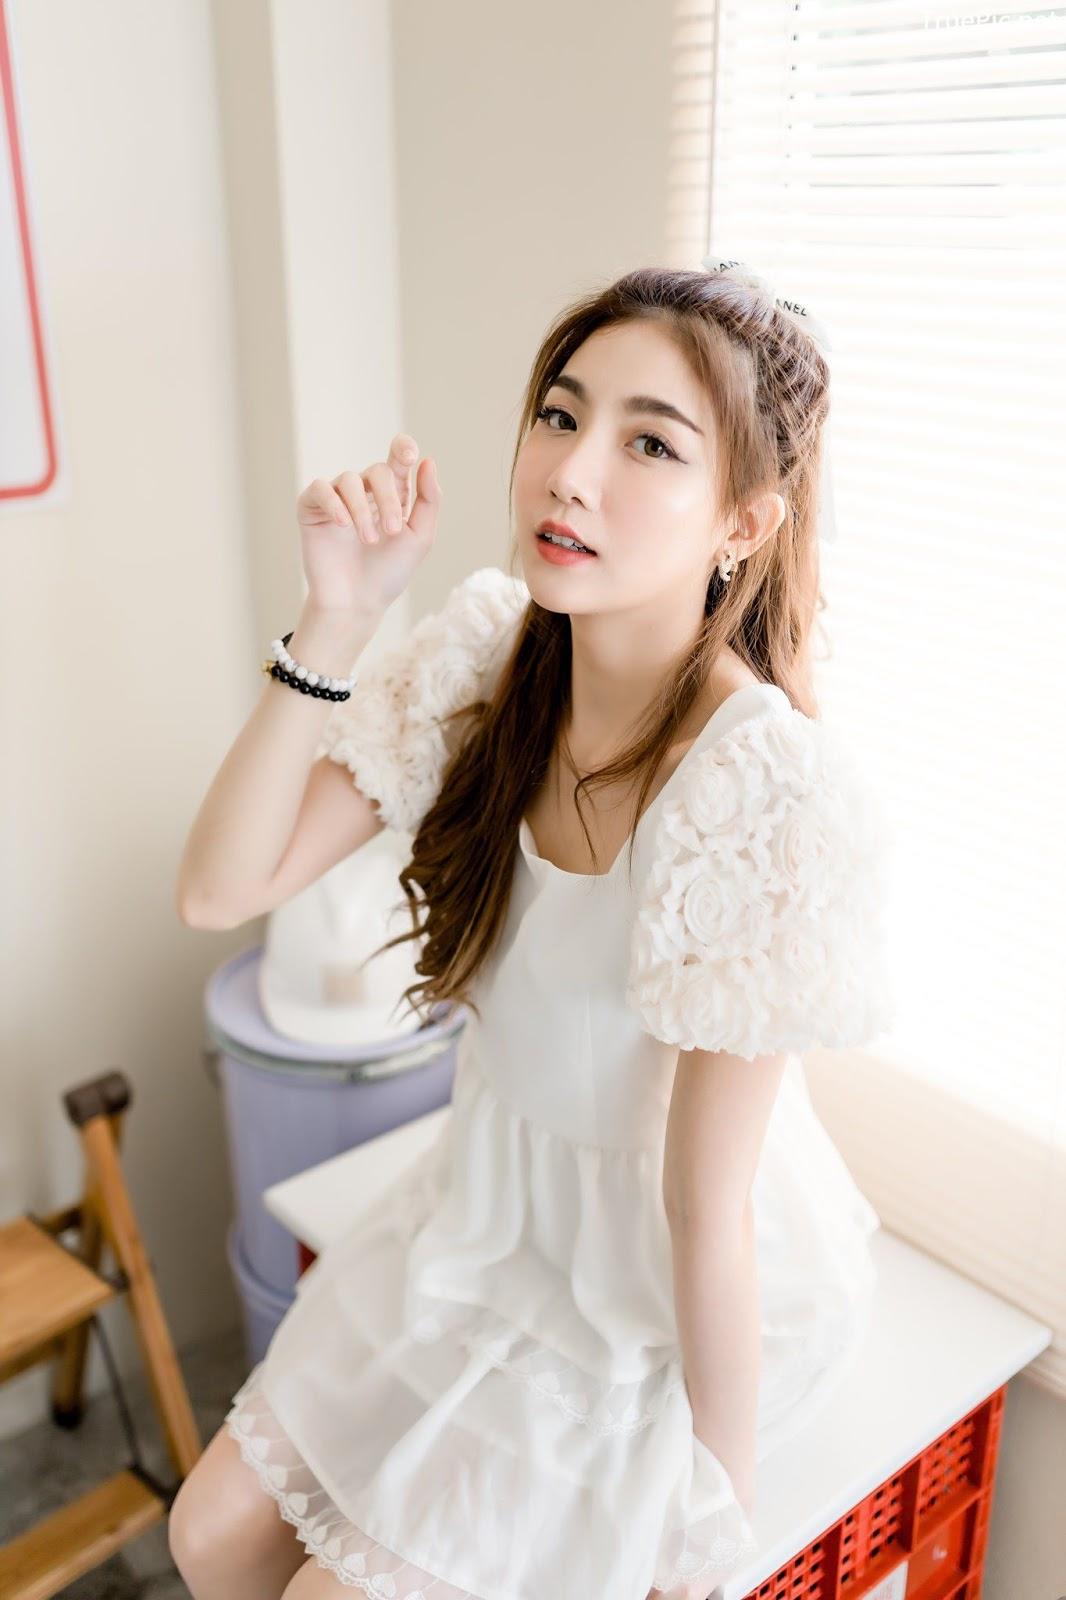 Image Thailand Model - Sasi Ngiunwan - Barbie Doll Smile - TruePic.net - Picture-11